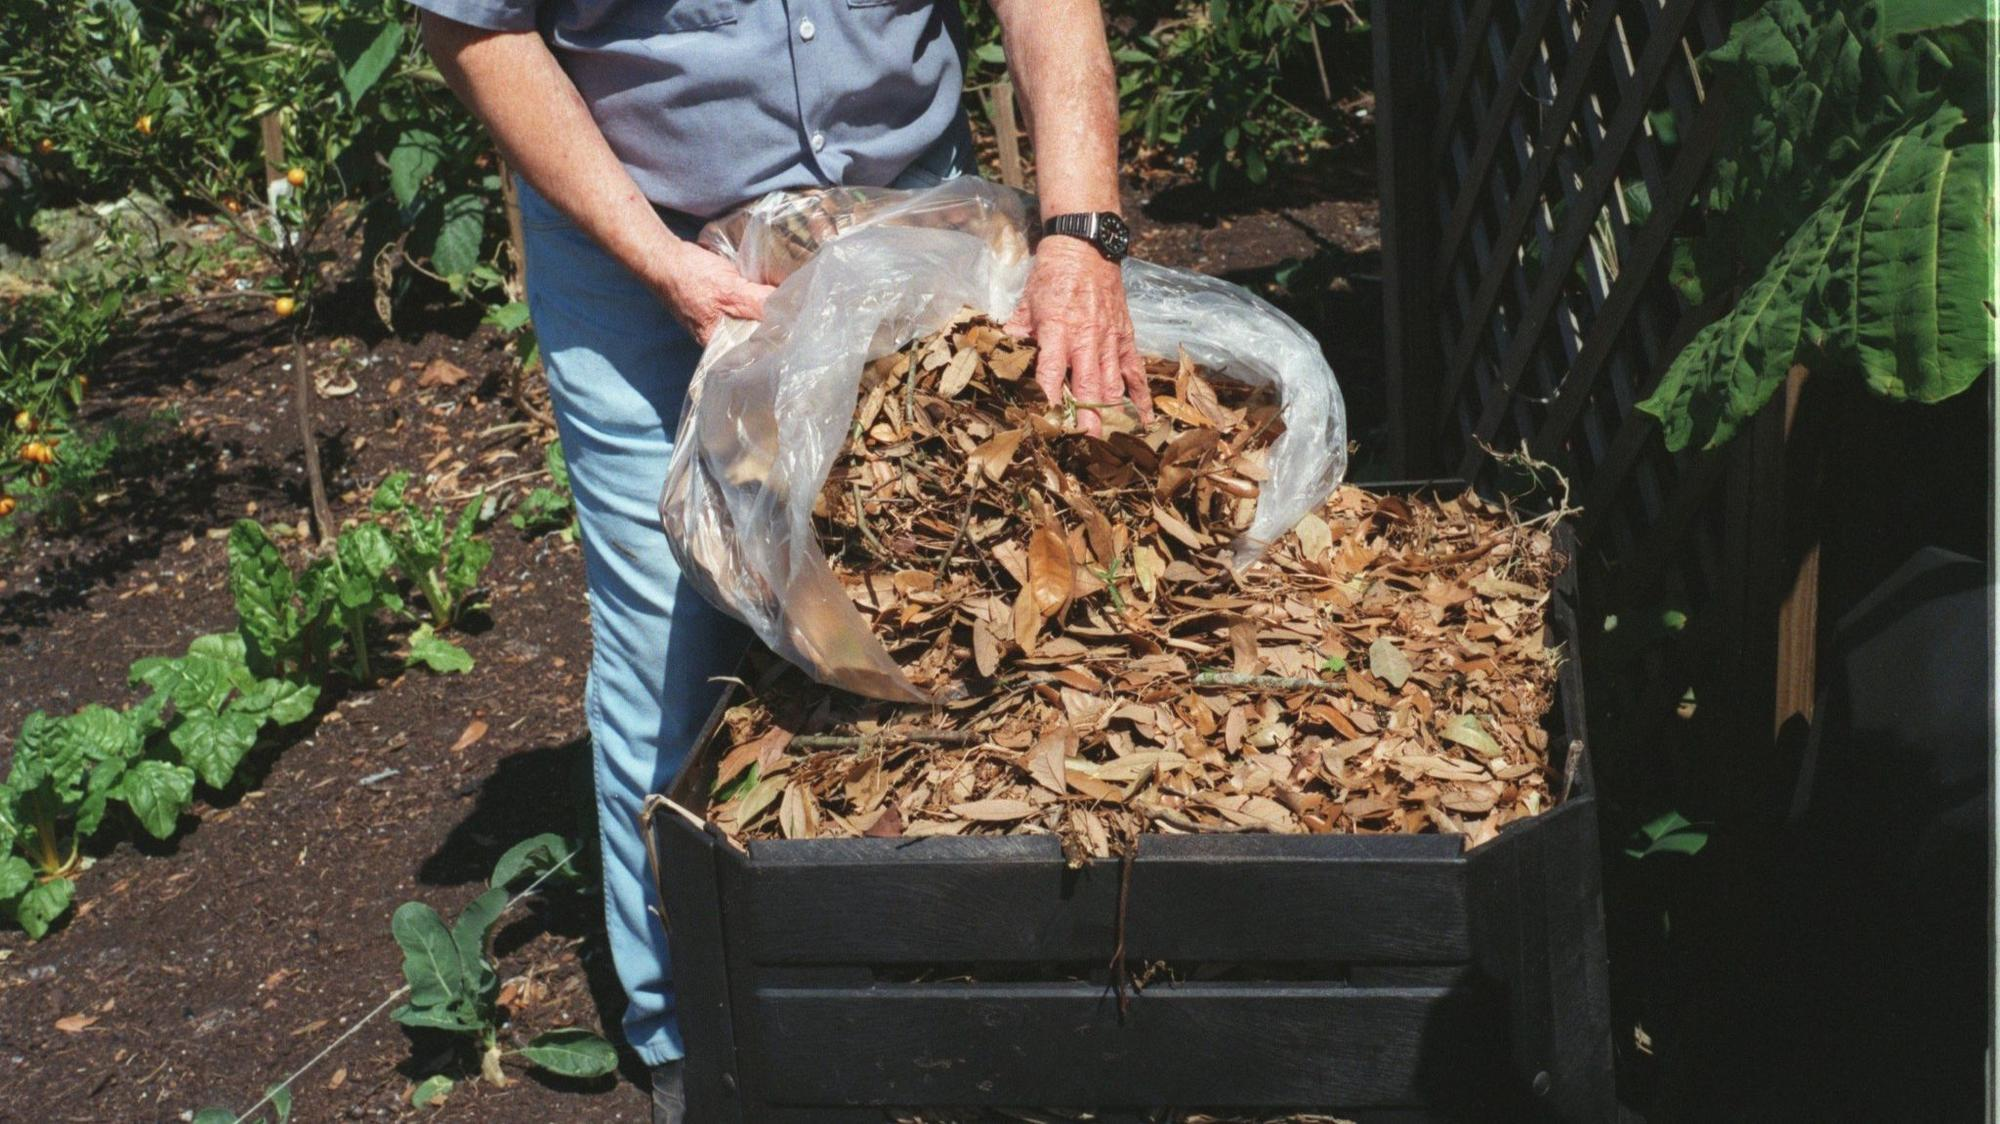 February in the garden - Orlando Sentinel